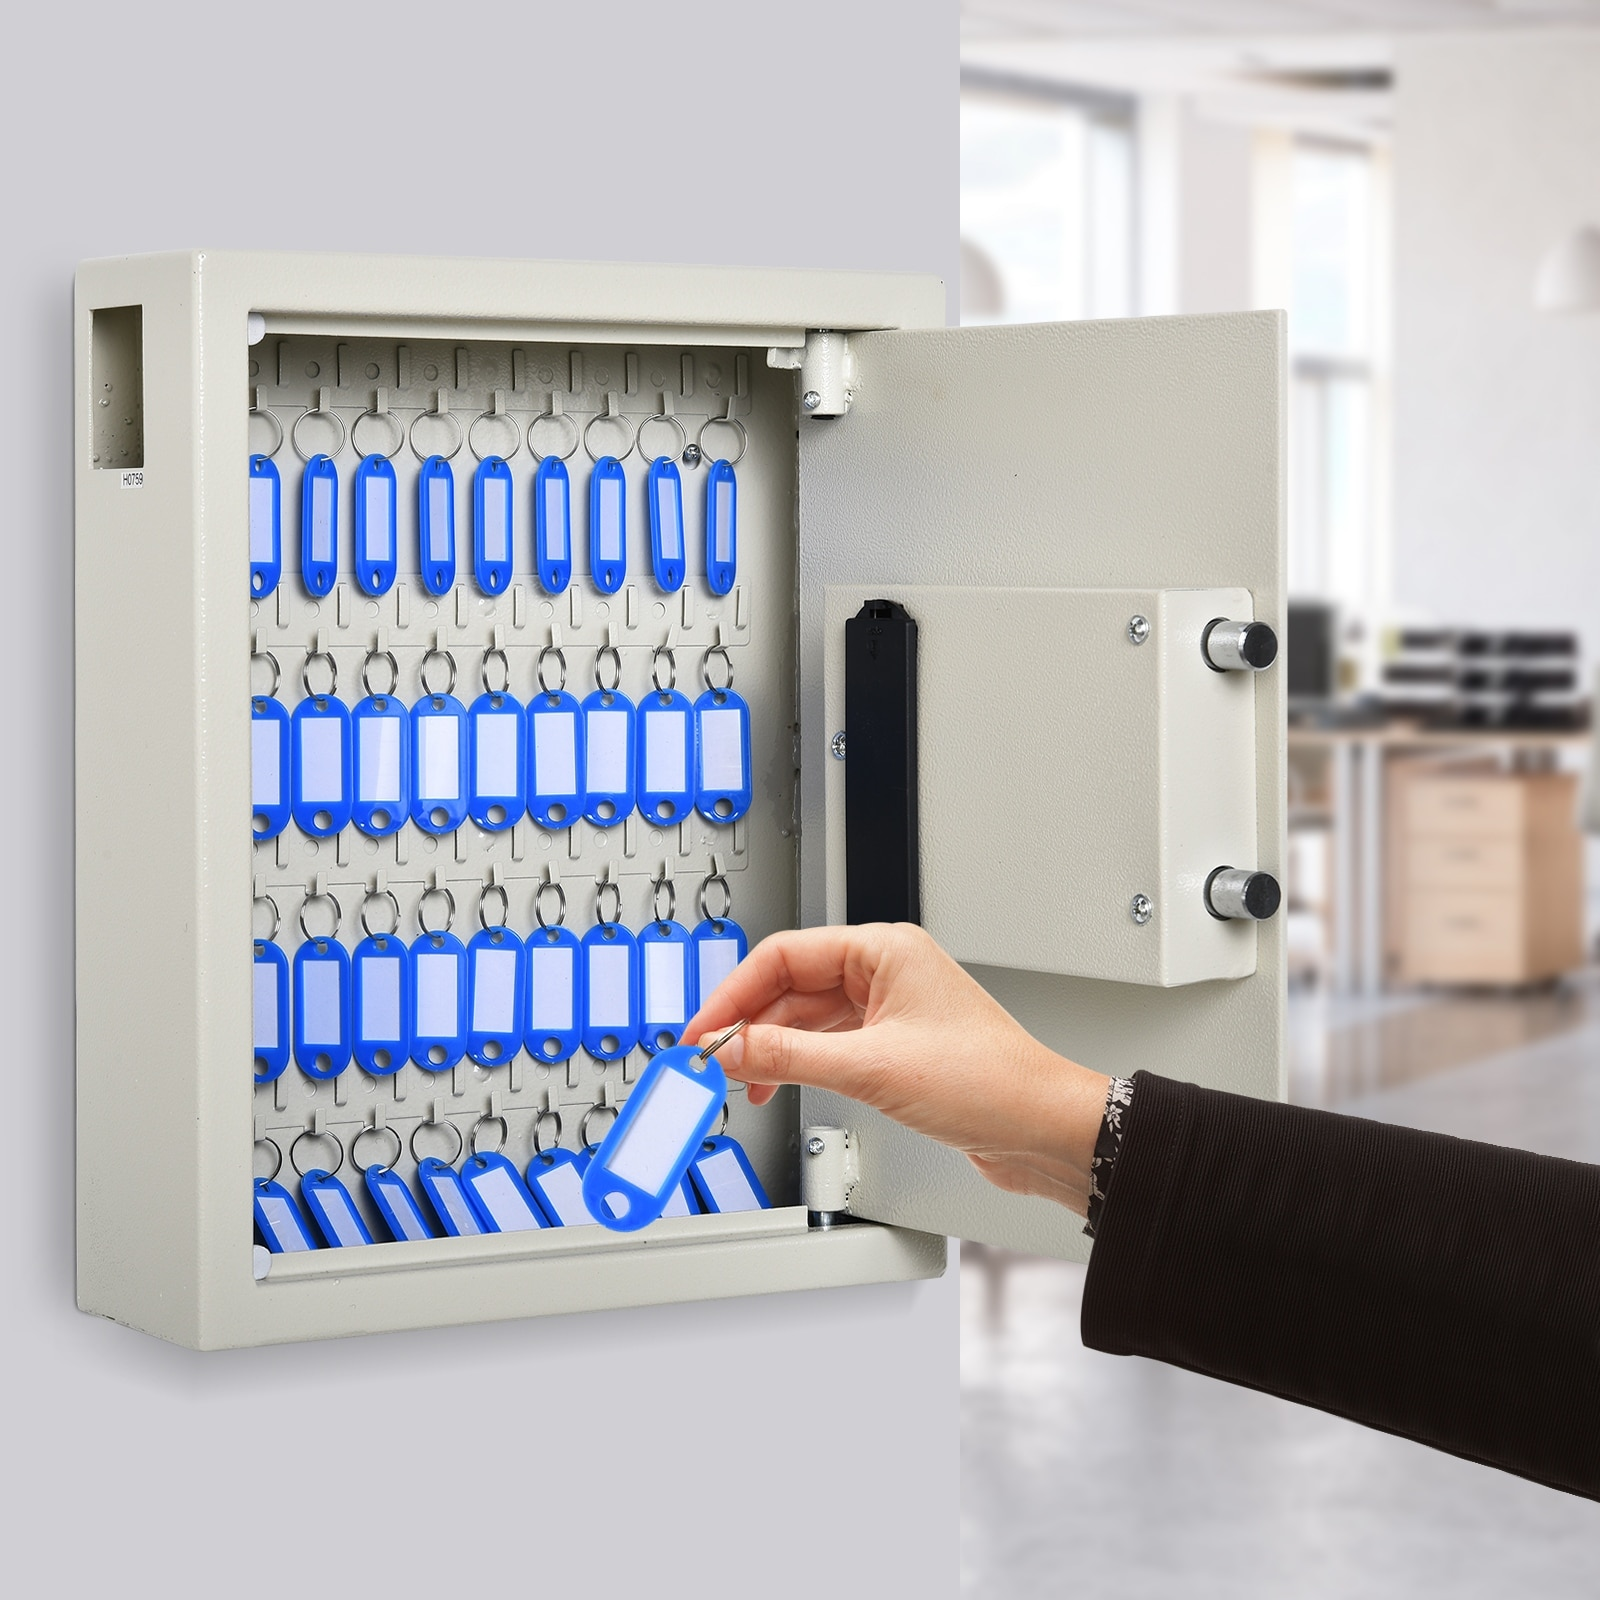 Xnonix 40 Steel Safe Hook Key Box w//Tag Digital Lock Storage Case Cabinet Wall Mount